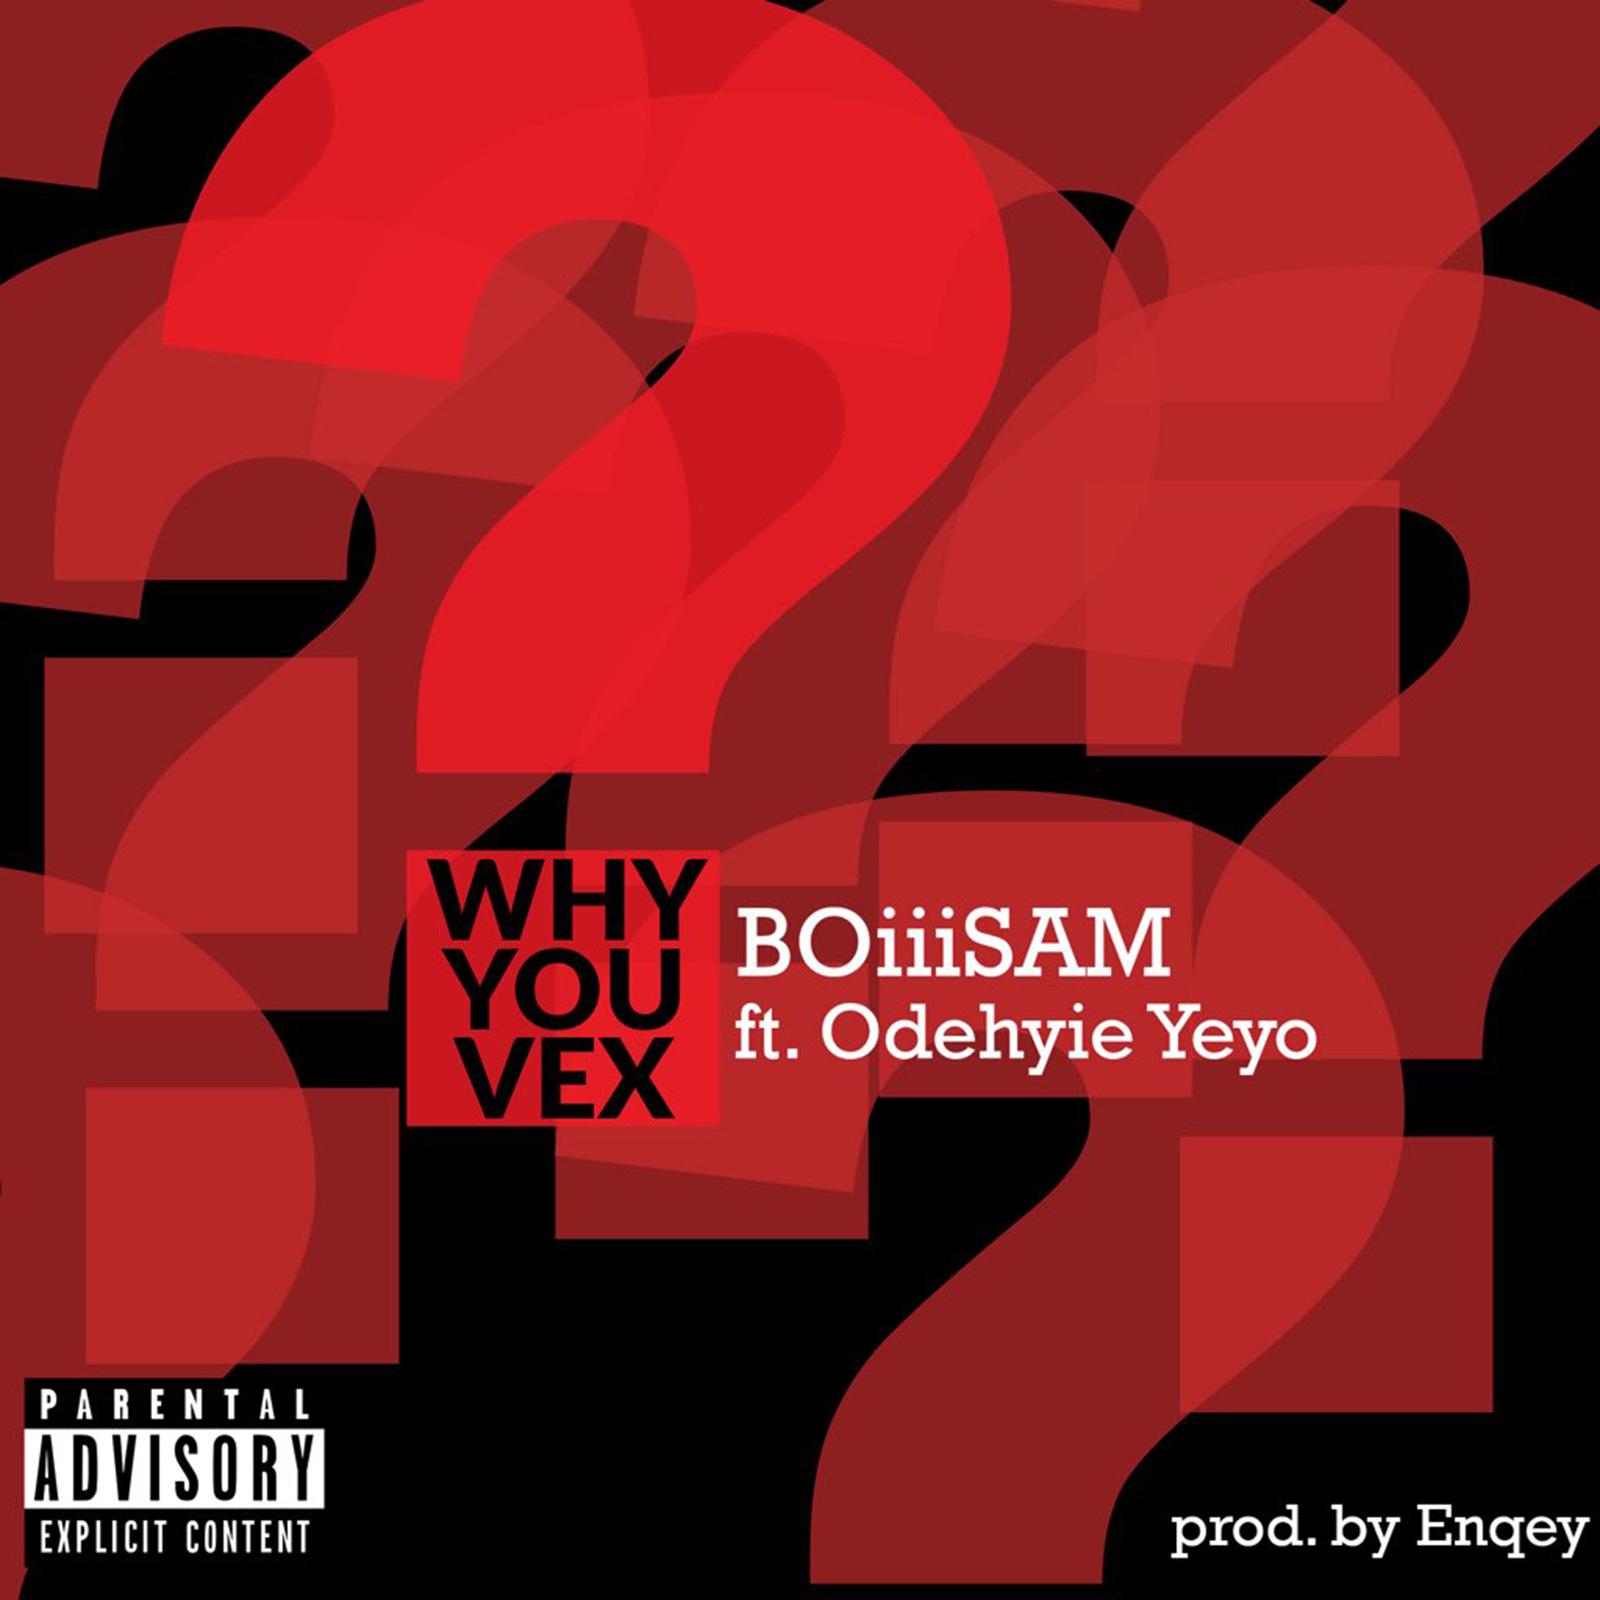 Why You Vex by BoiiiSam feat. Odehyie Yeyo